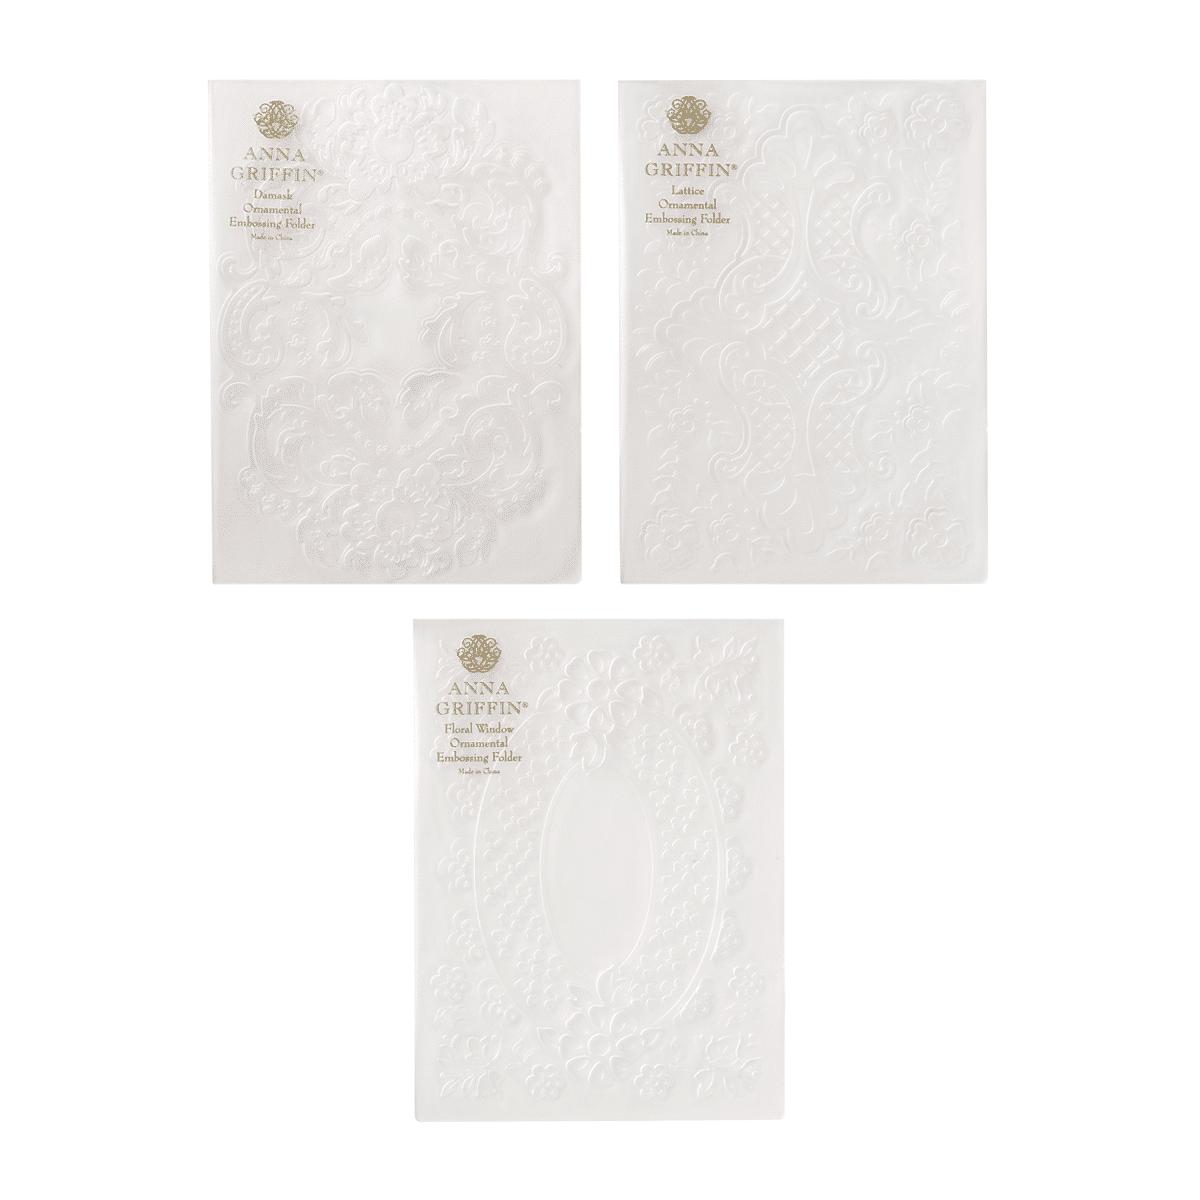 ornamental 3d embossing folders